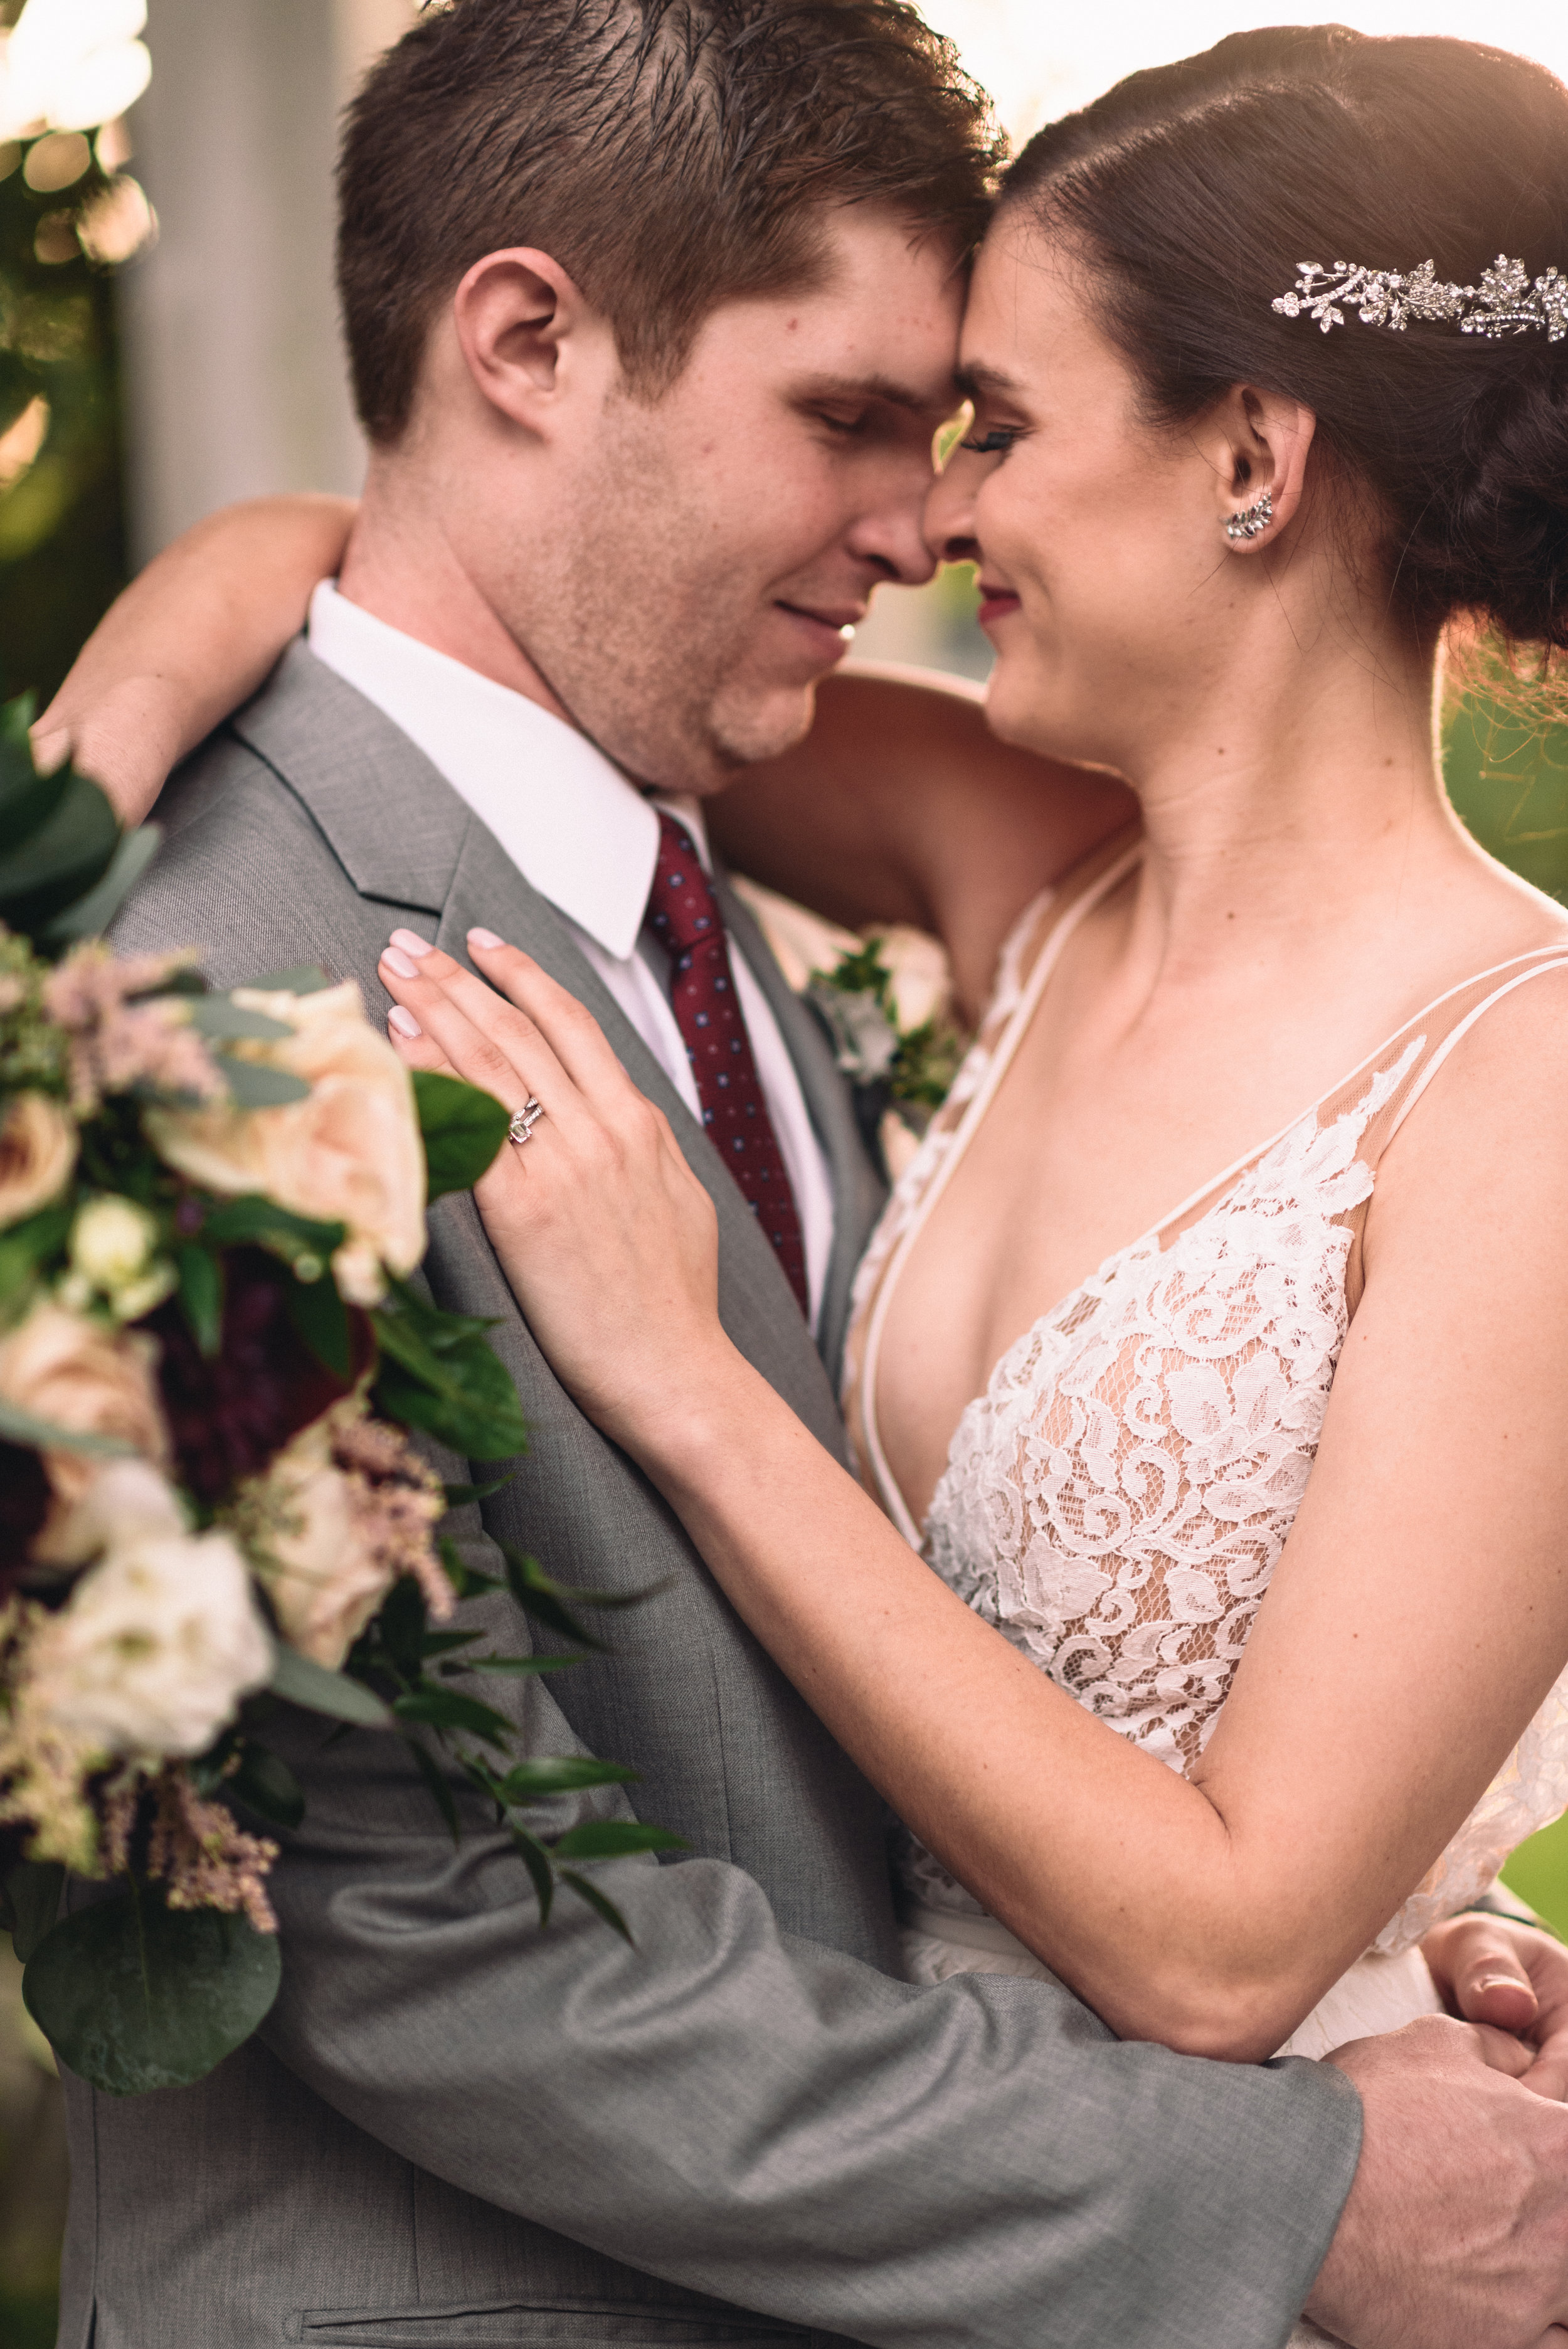 richardson.wedding.houston (248 of 604).jpg